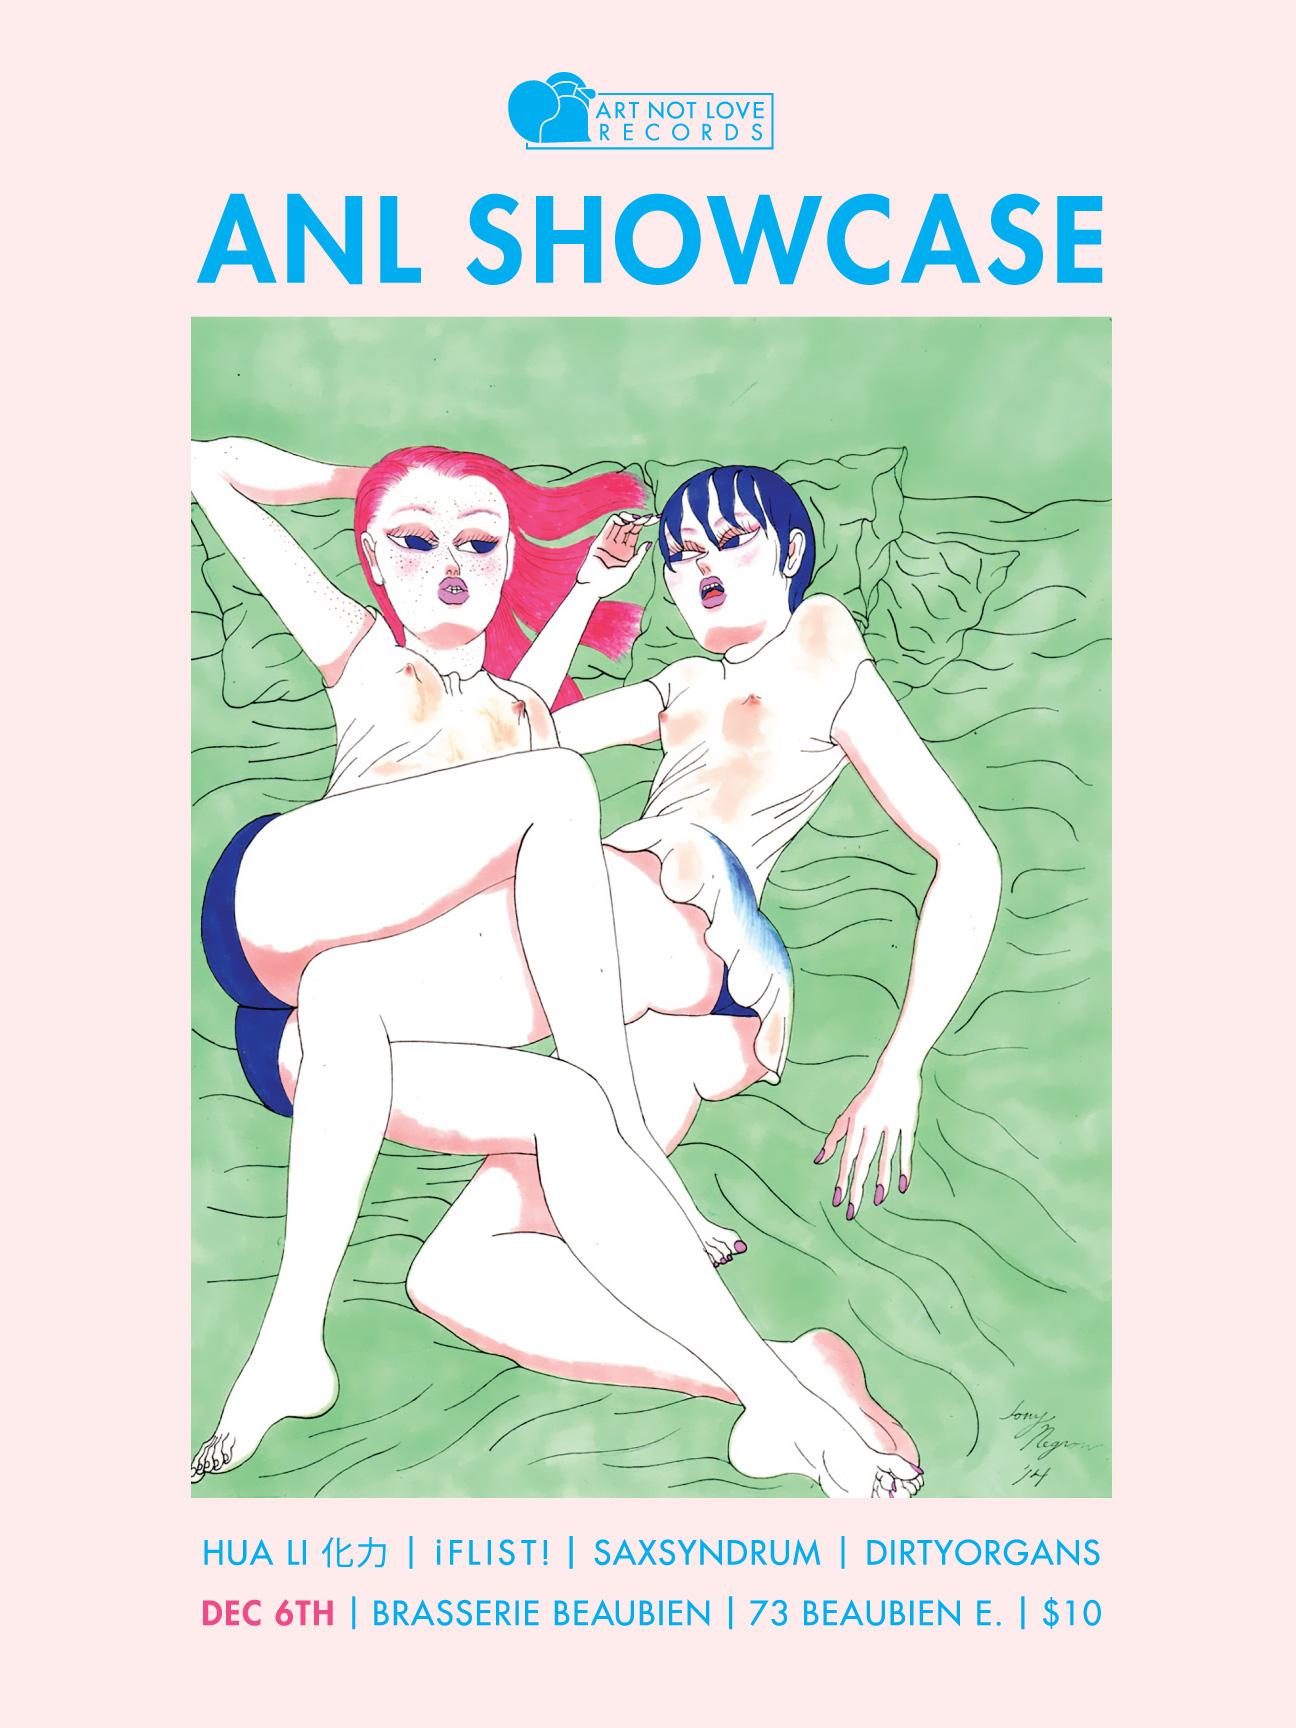 ANL-Showcase-Dec-6th-2014